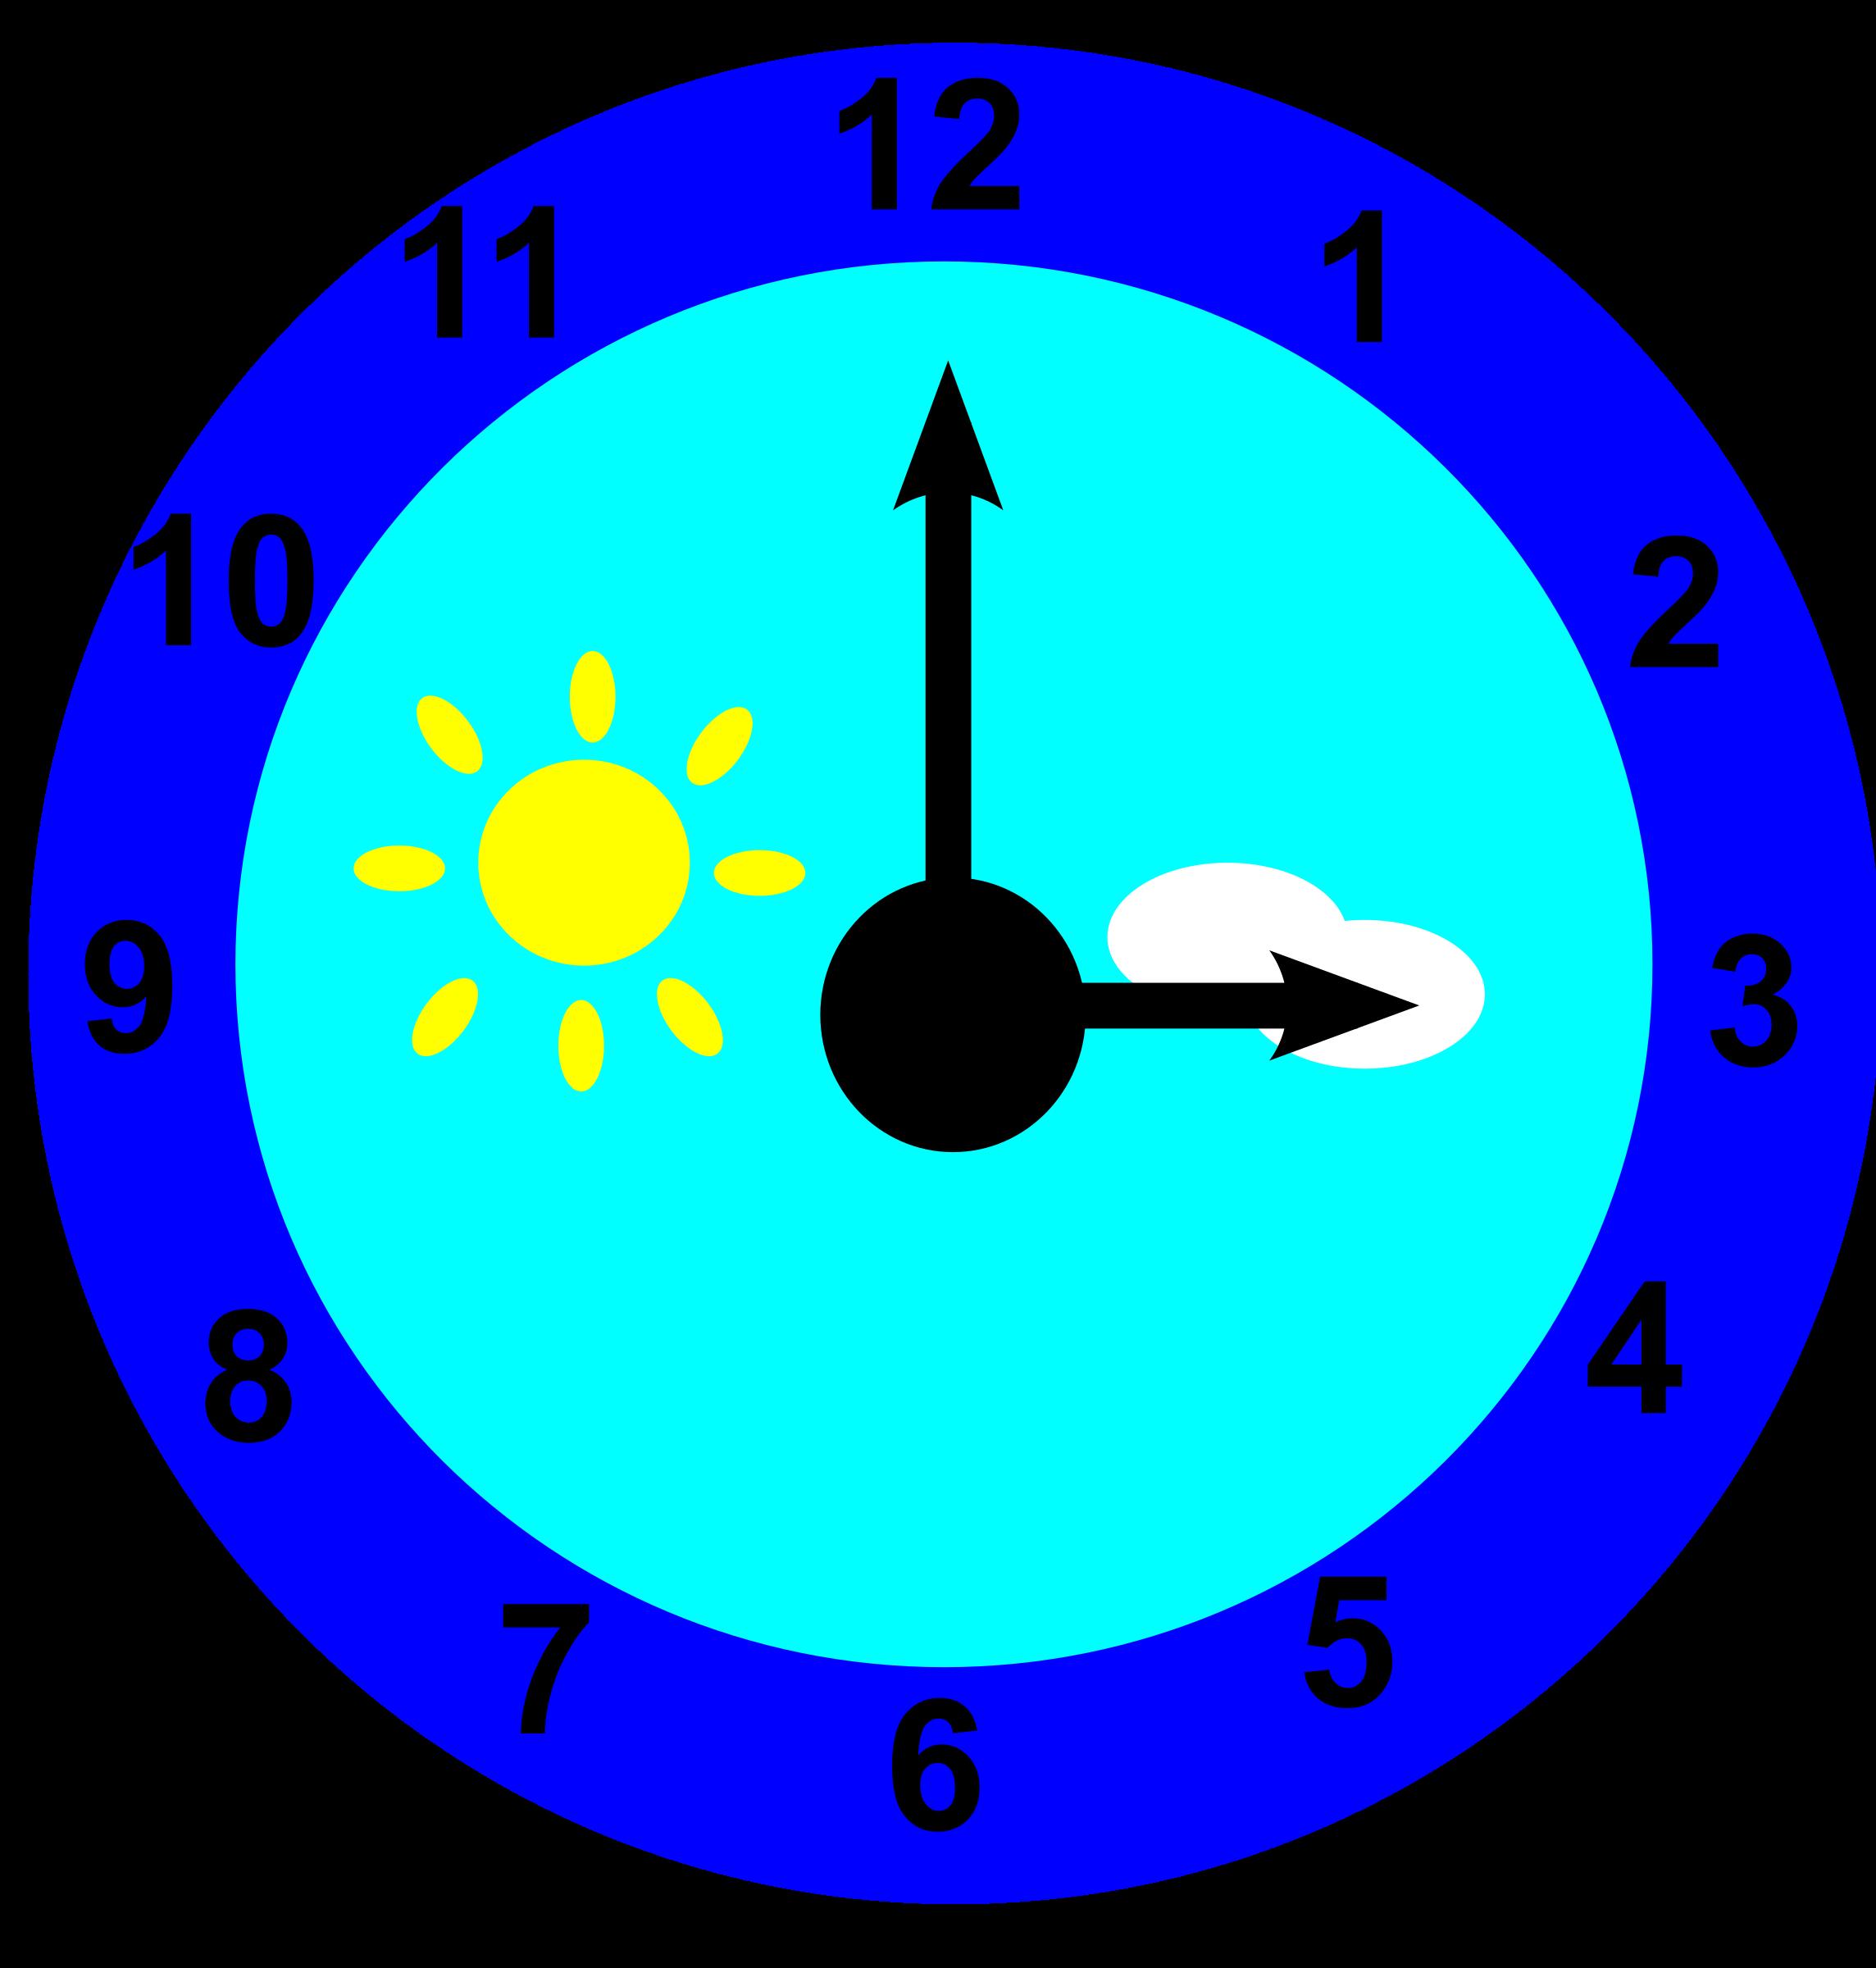 Clipart clock circle. Is pointing at three